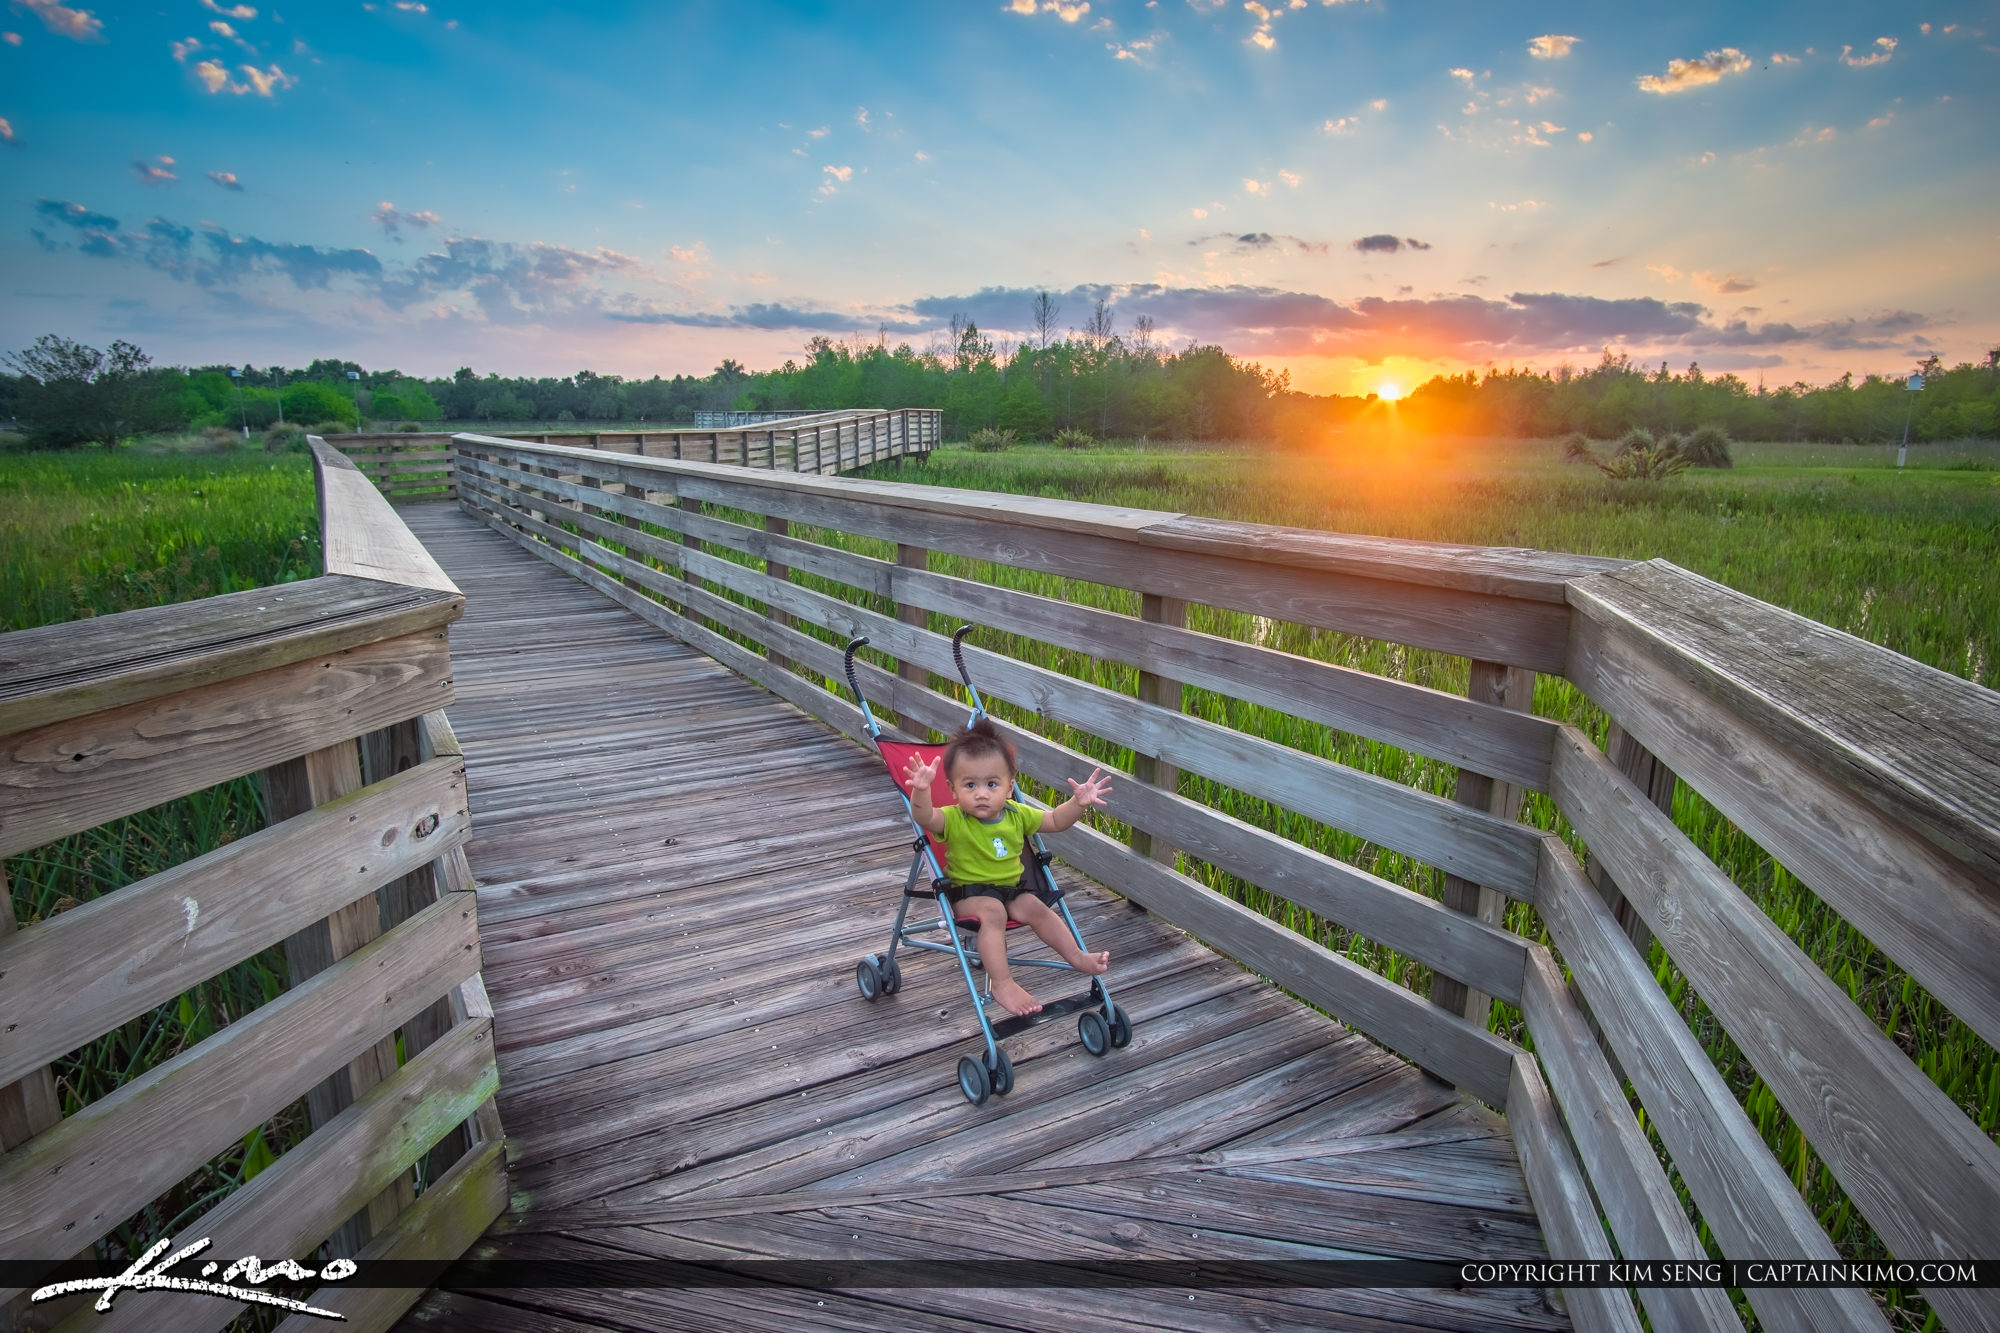 Captain Kimo Junior at Green Cay Wetlands Sunset